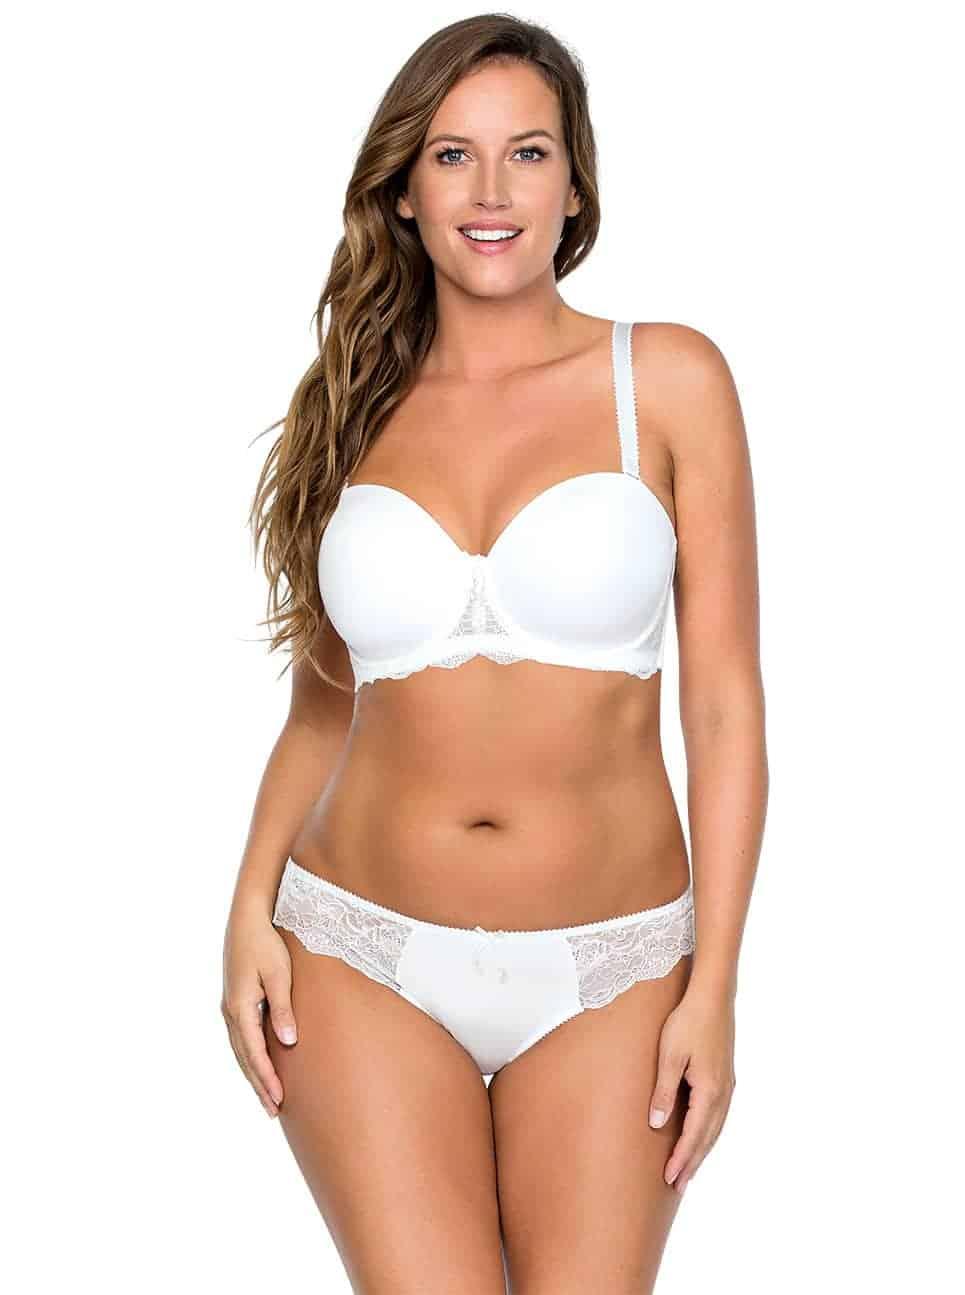 4538261b990e05 Elissa StraplessBraP5011 BrazilianThongP5014 PearlWhite Front copy - Elissa  Strapless Bra - Pearl White - P5011 ...